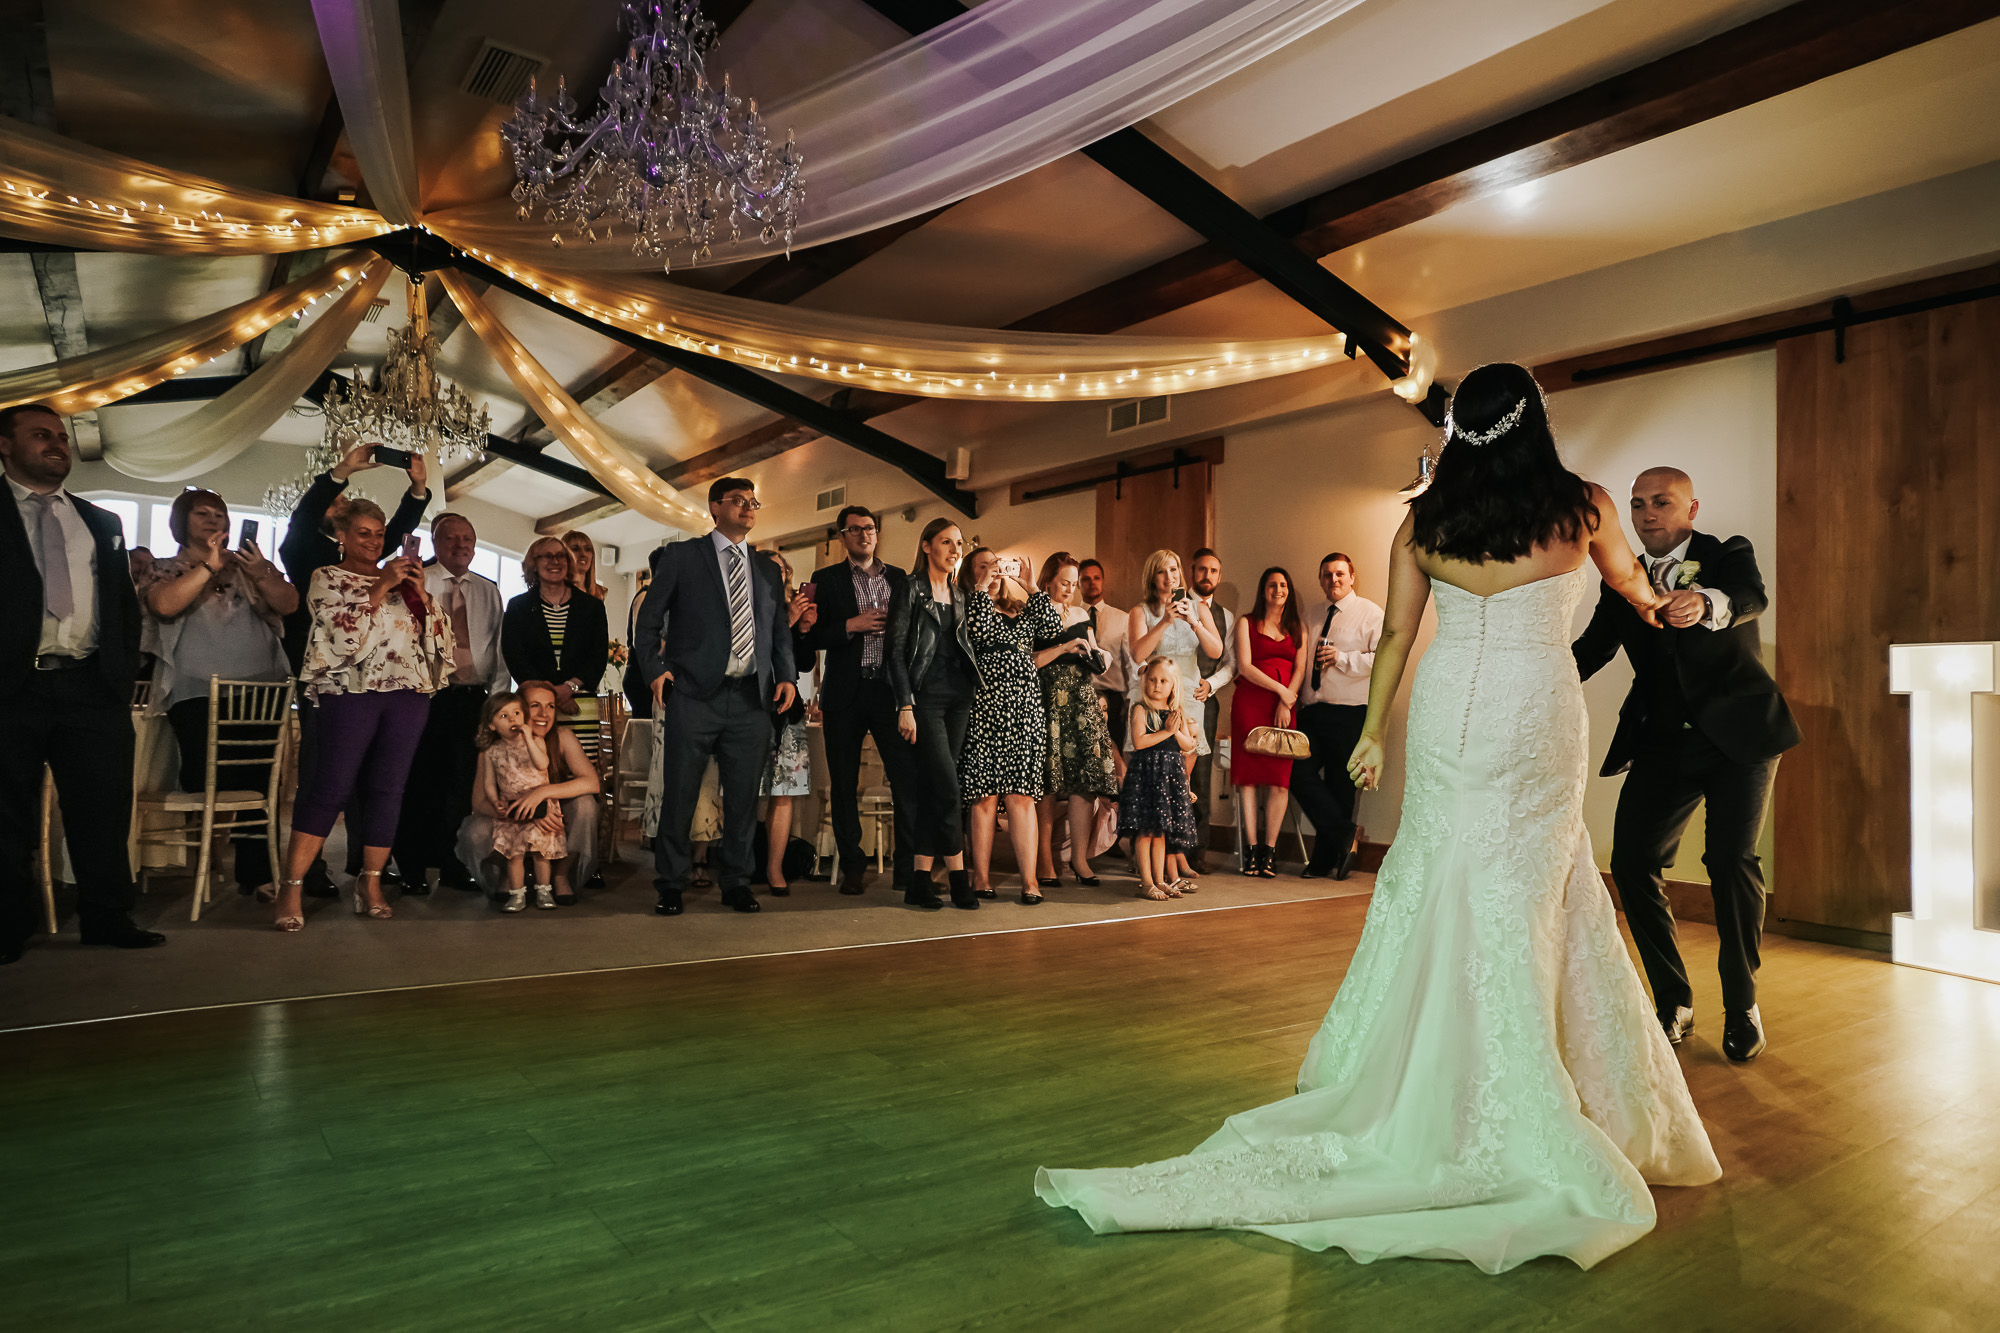 Hyde Bank Farm Wedding Photography Manchester wedding photographer (46 of 49).jpg